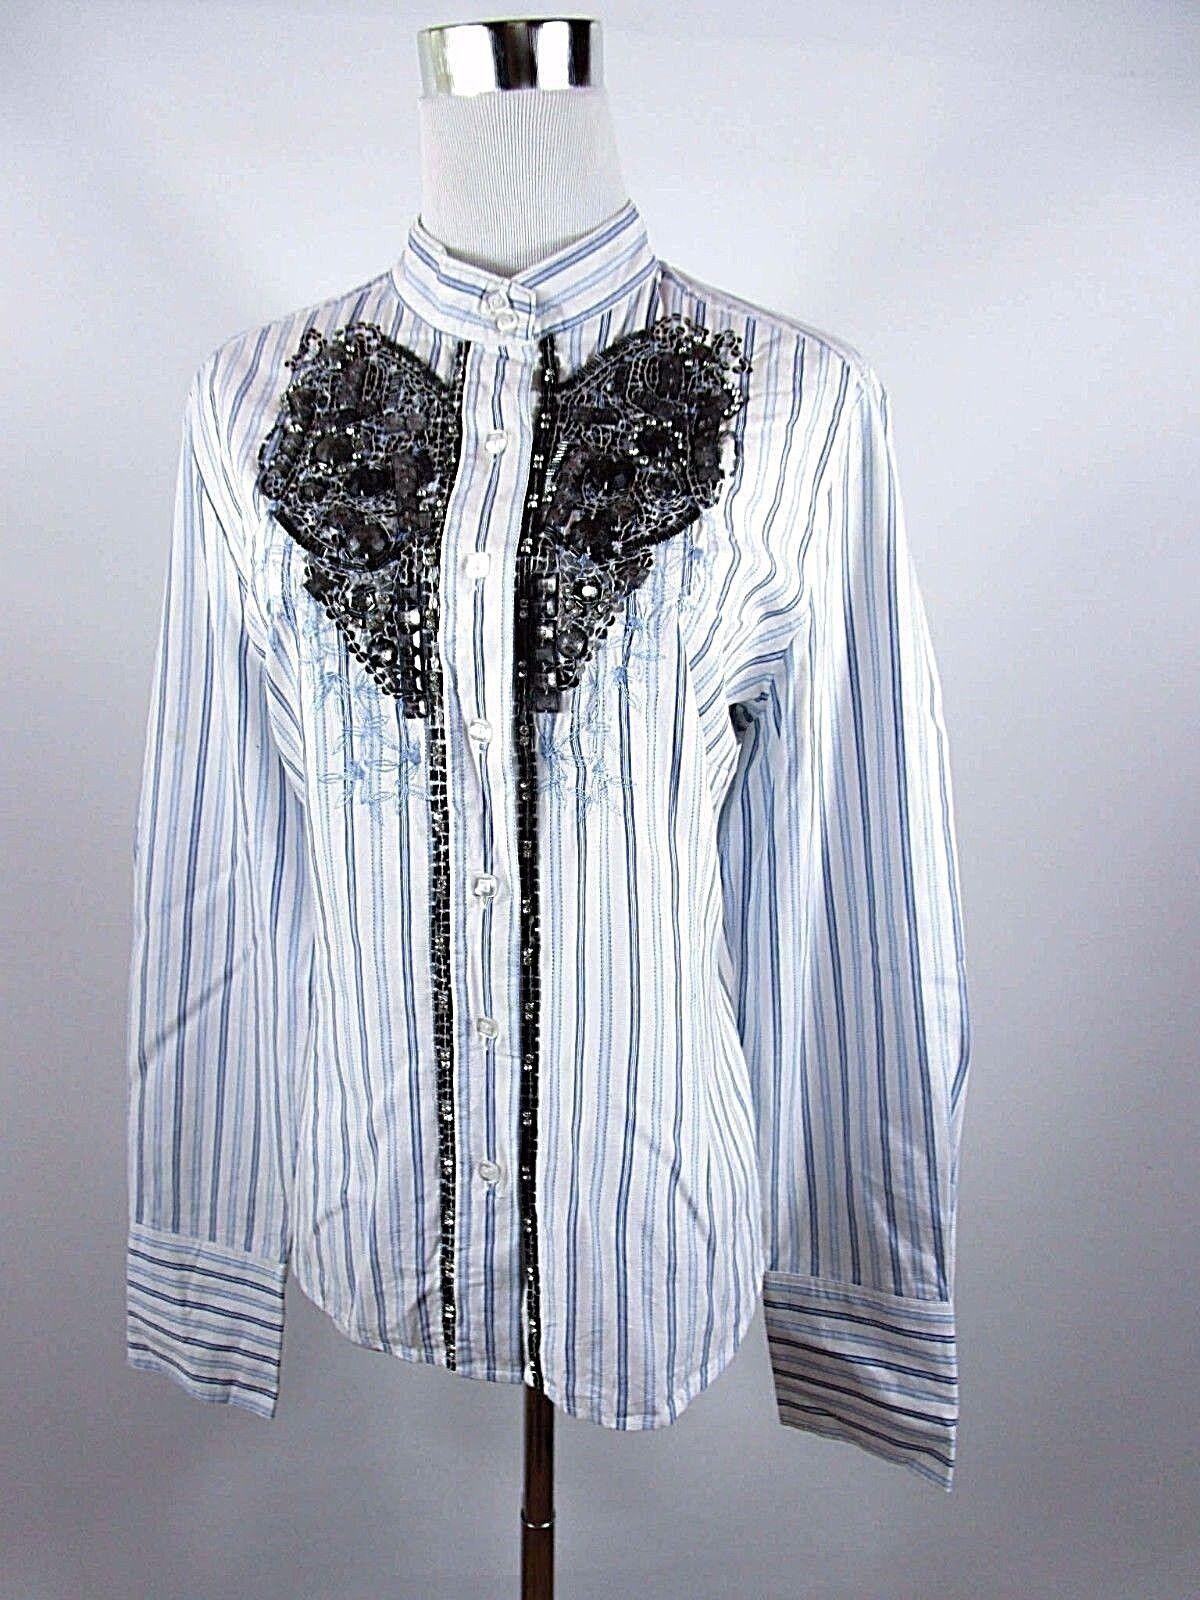 NIENHAUS WOMAN Embellished Women Casual Striped Print Cotton Shirt sz 16 XL BD41